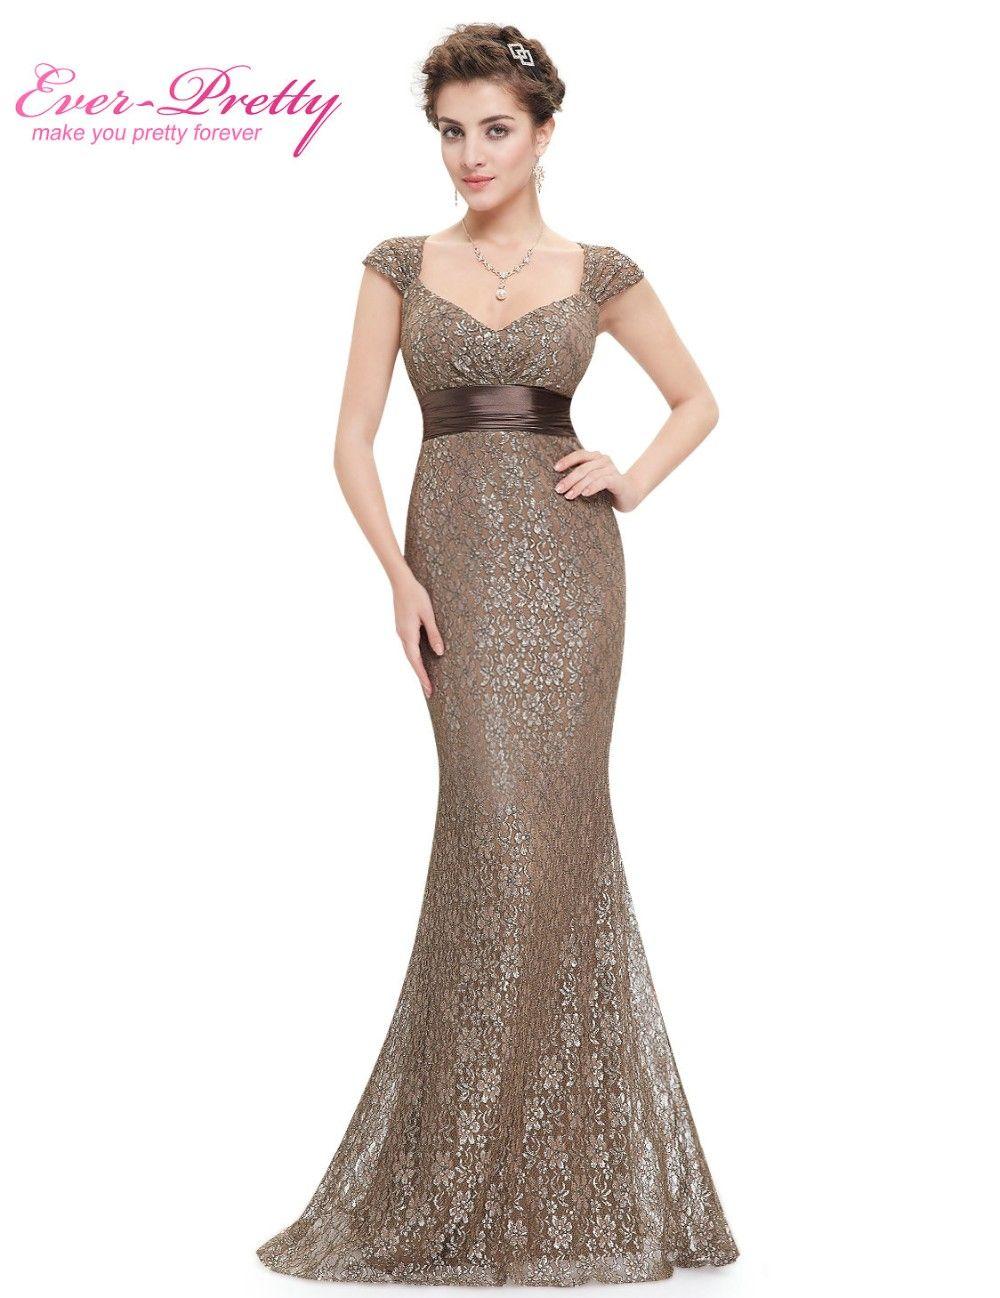 Womenus elegant peach collar long evening party dresses ever pretty